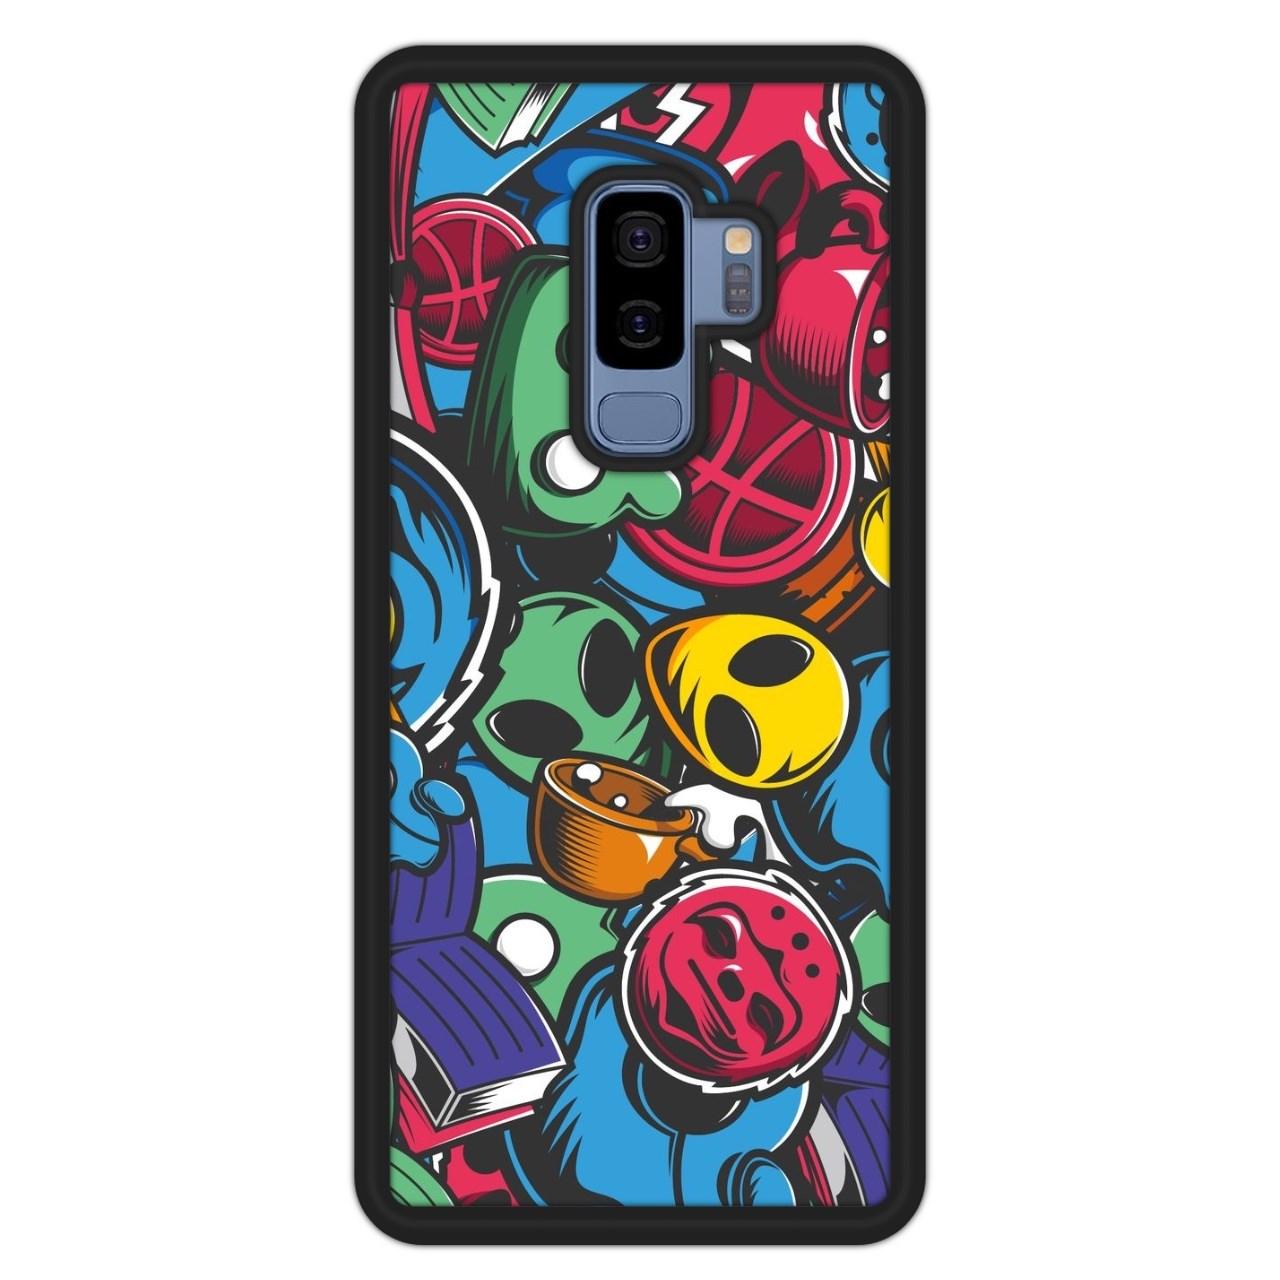 کاور آکام مدل AS9P0124  مناسب برای گوشی موبایل سامسونگ گلکسی اس 9 پلاس